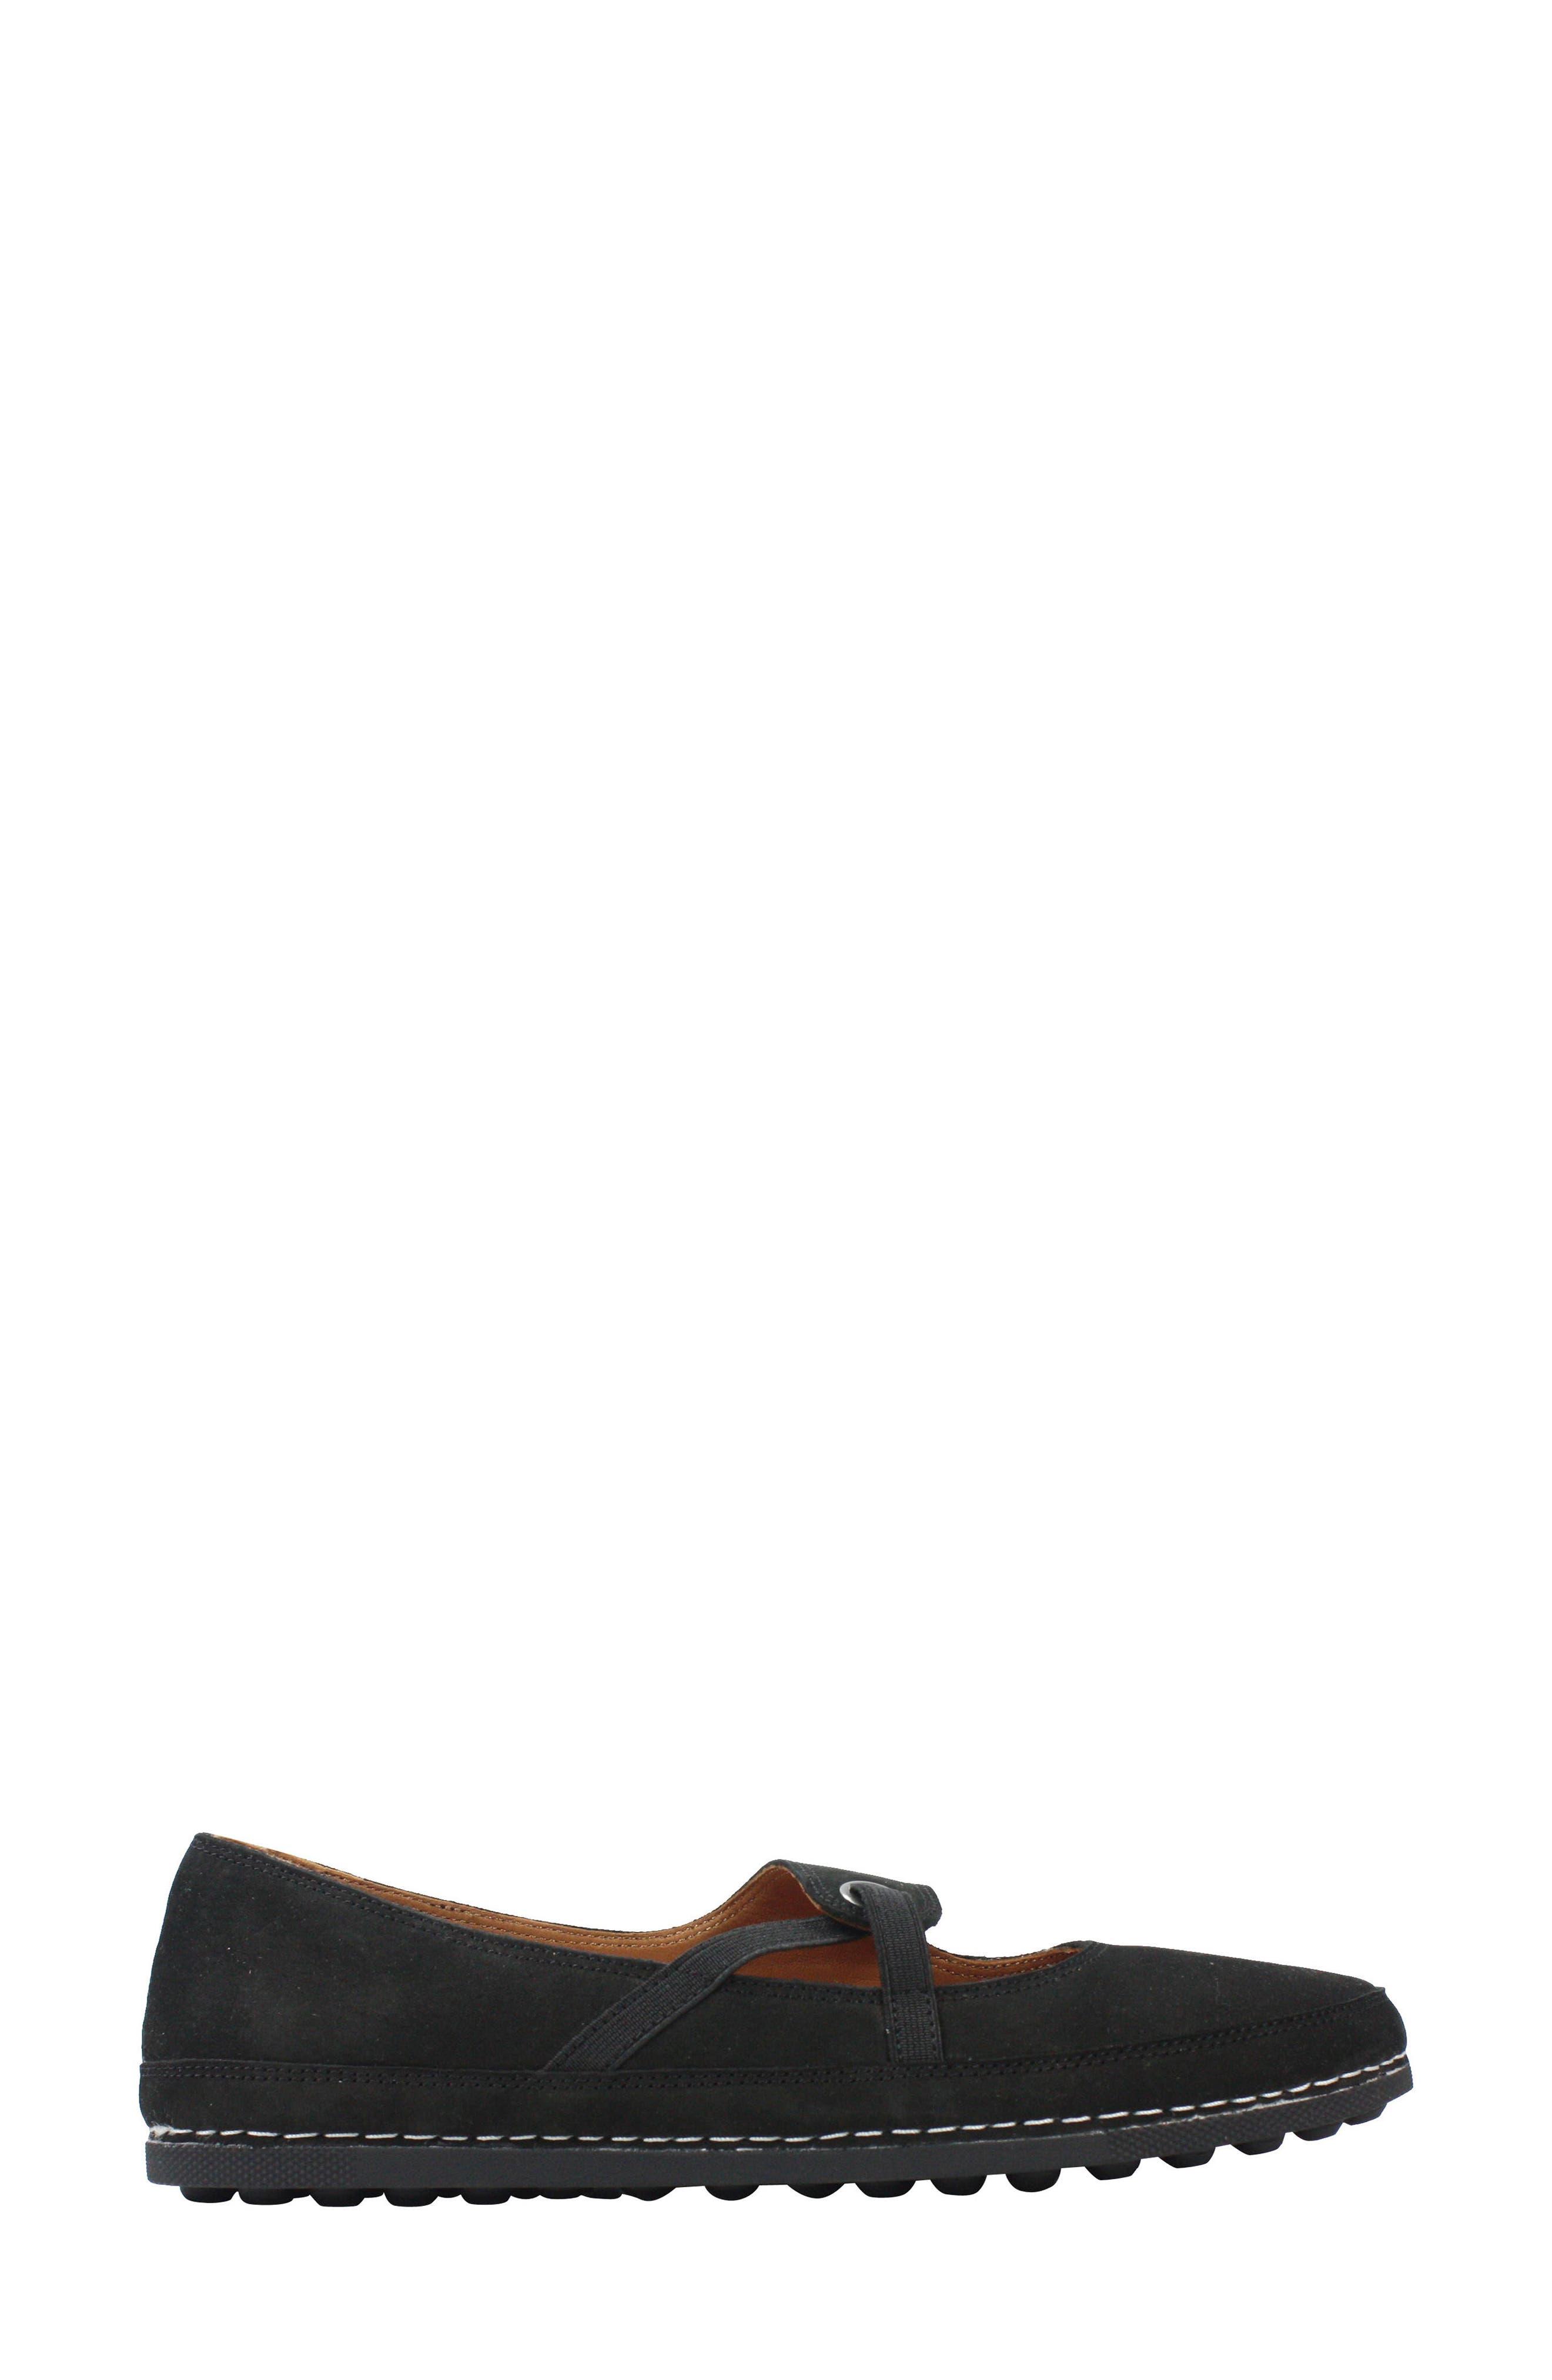 Denisse Mary Jane Flat,                             Alternate thumbnail 3, color,                             Black Nubuck Leather